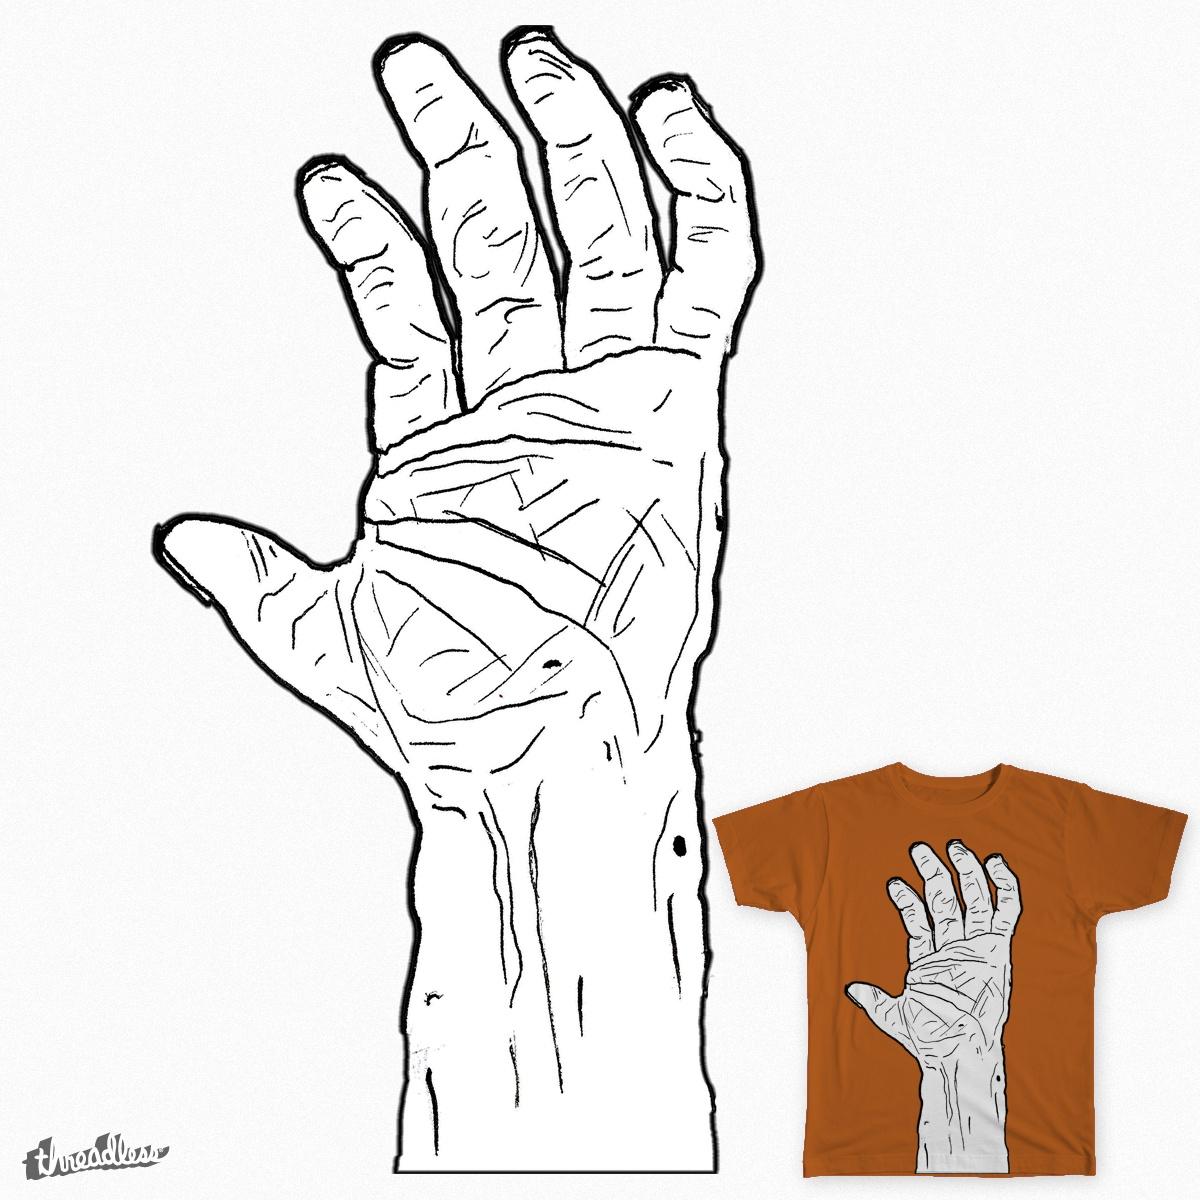 Hand Up by davidgeva on Threadless